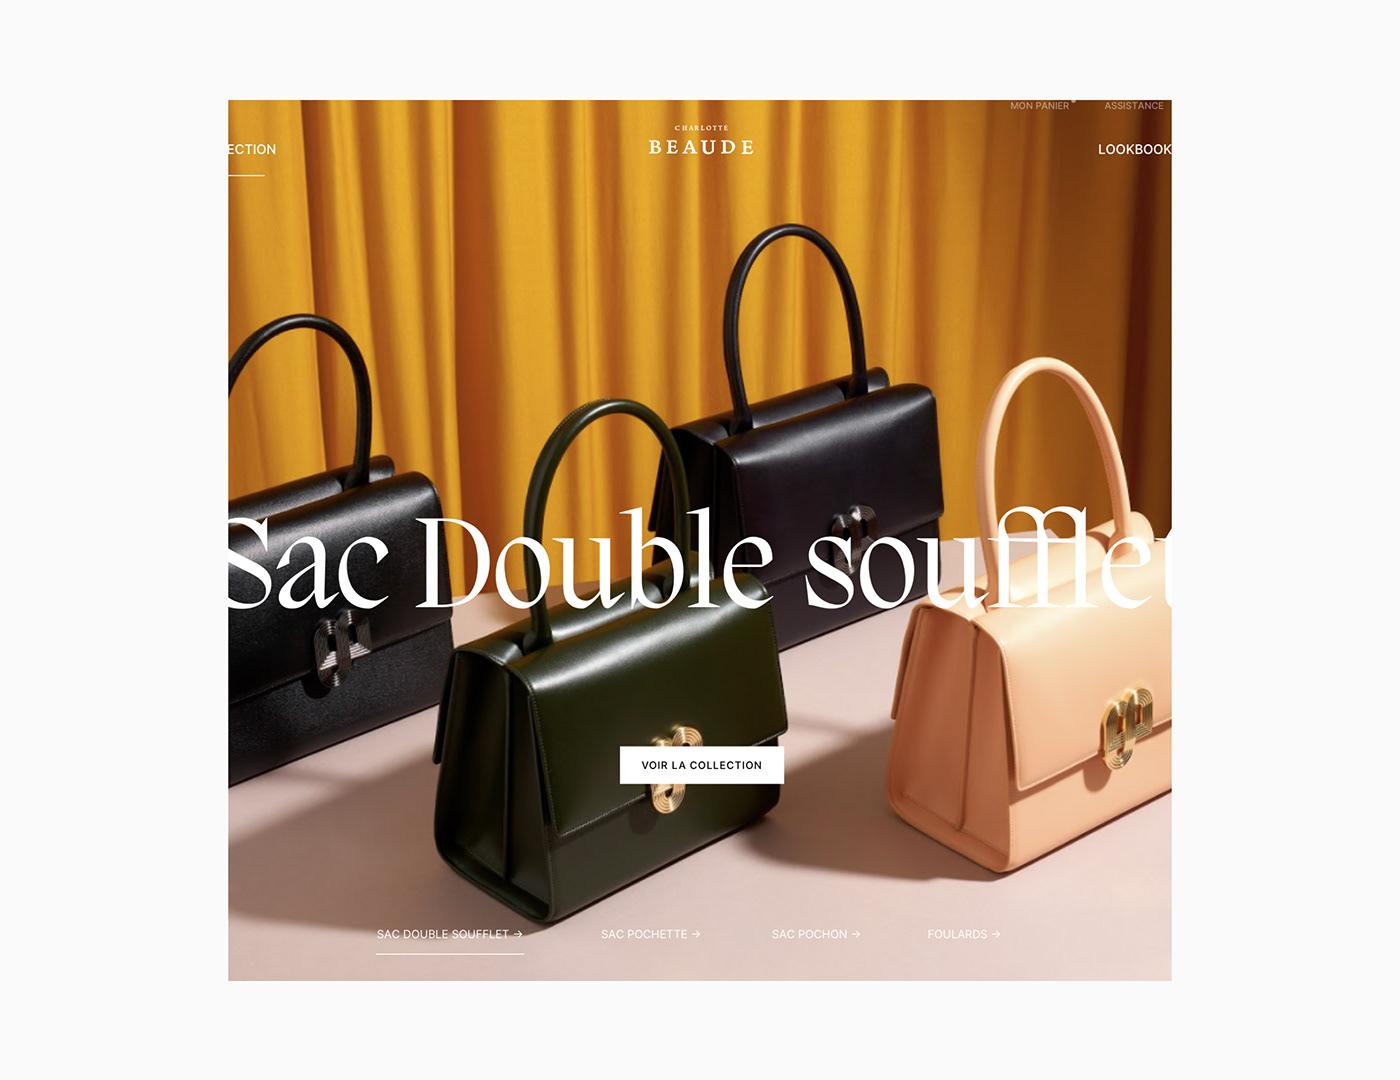 Image may contain: handbag and luggage and bags